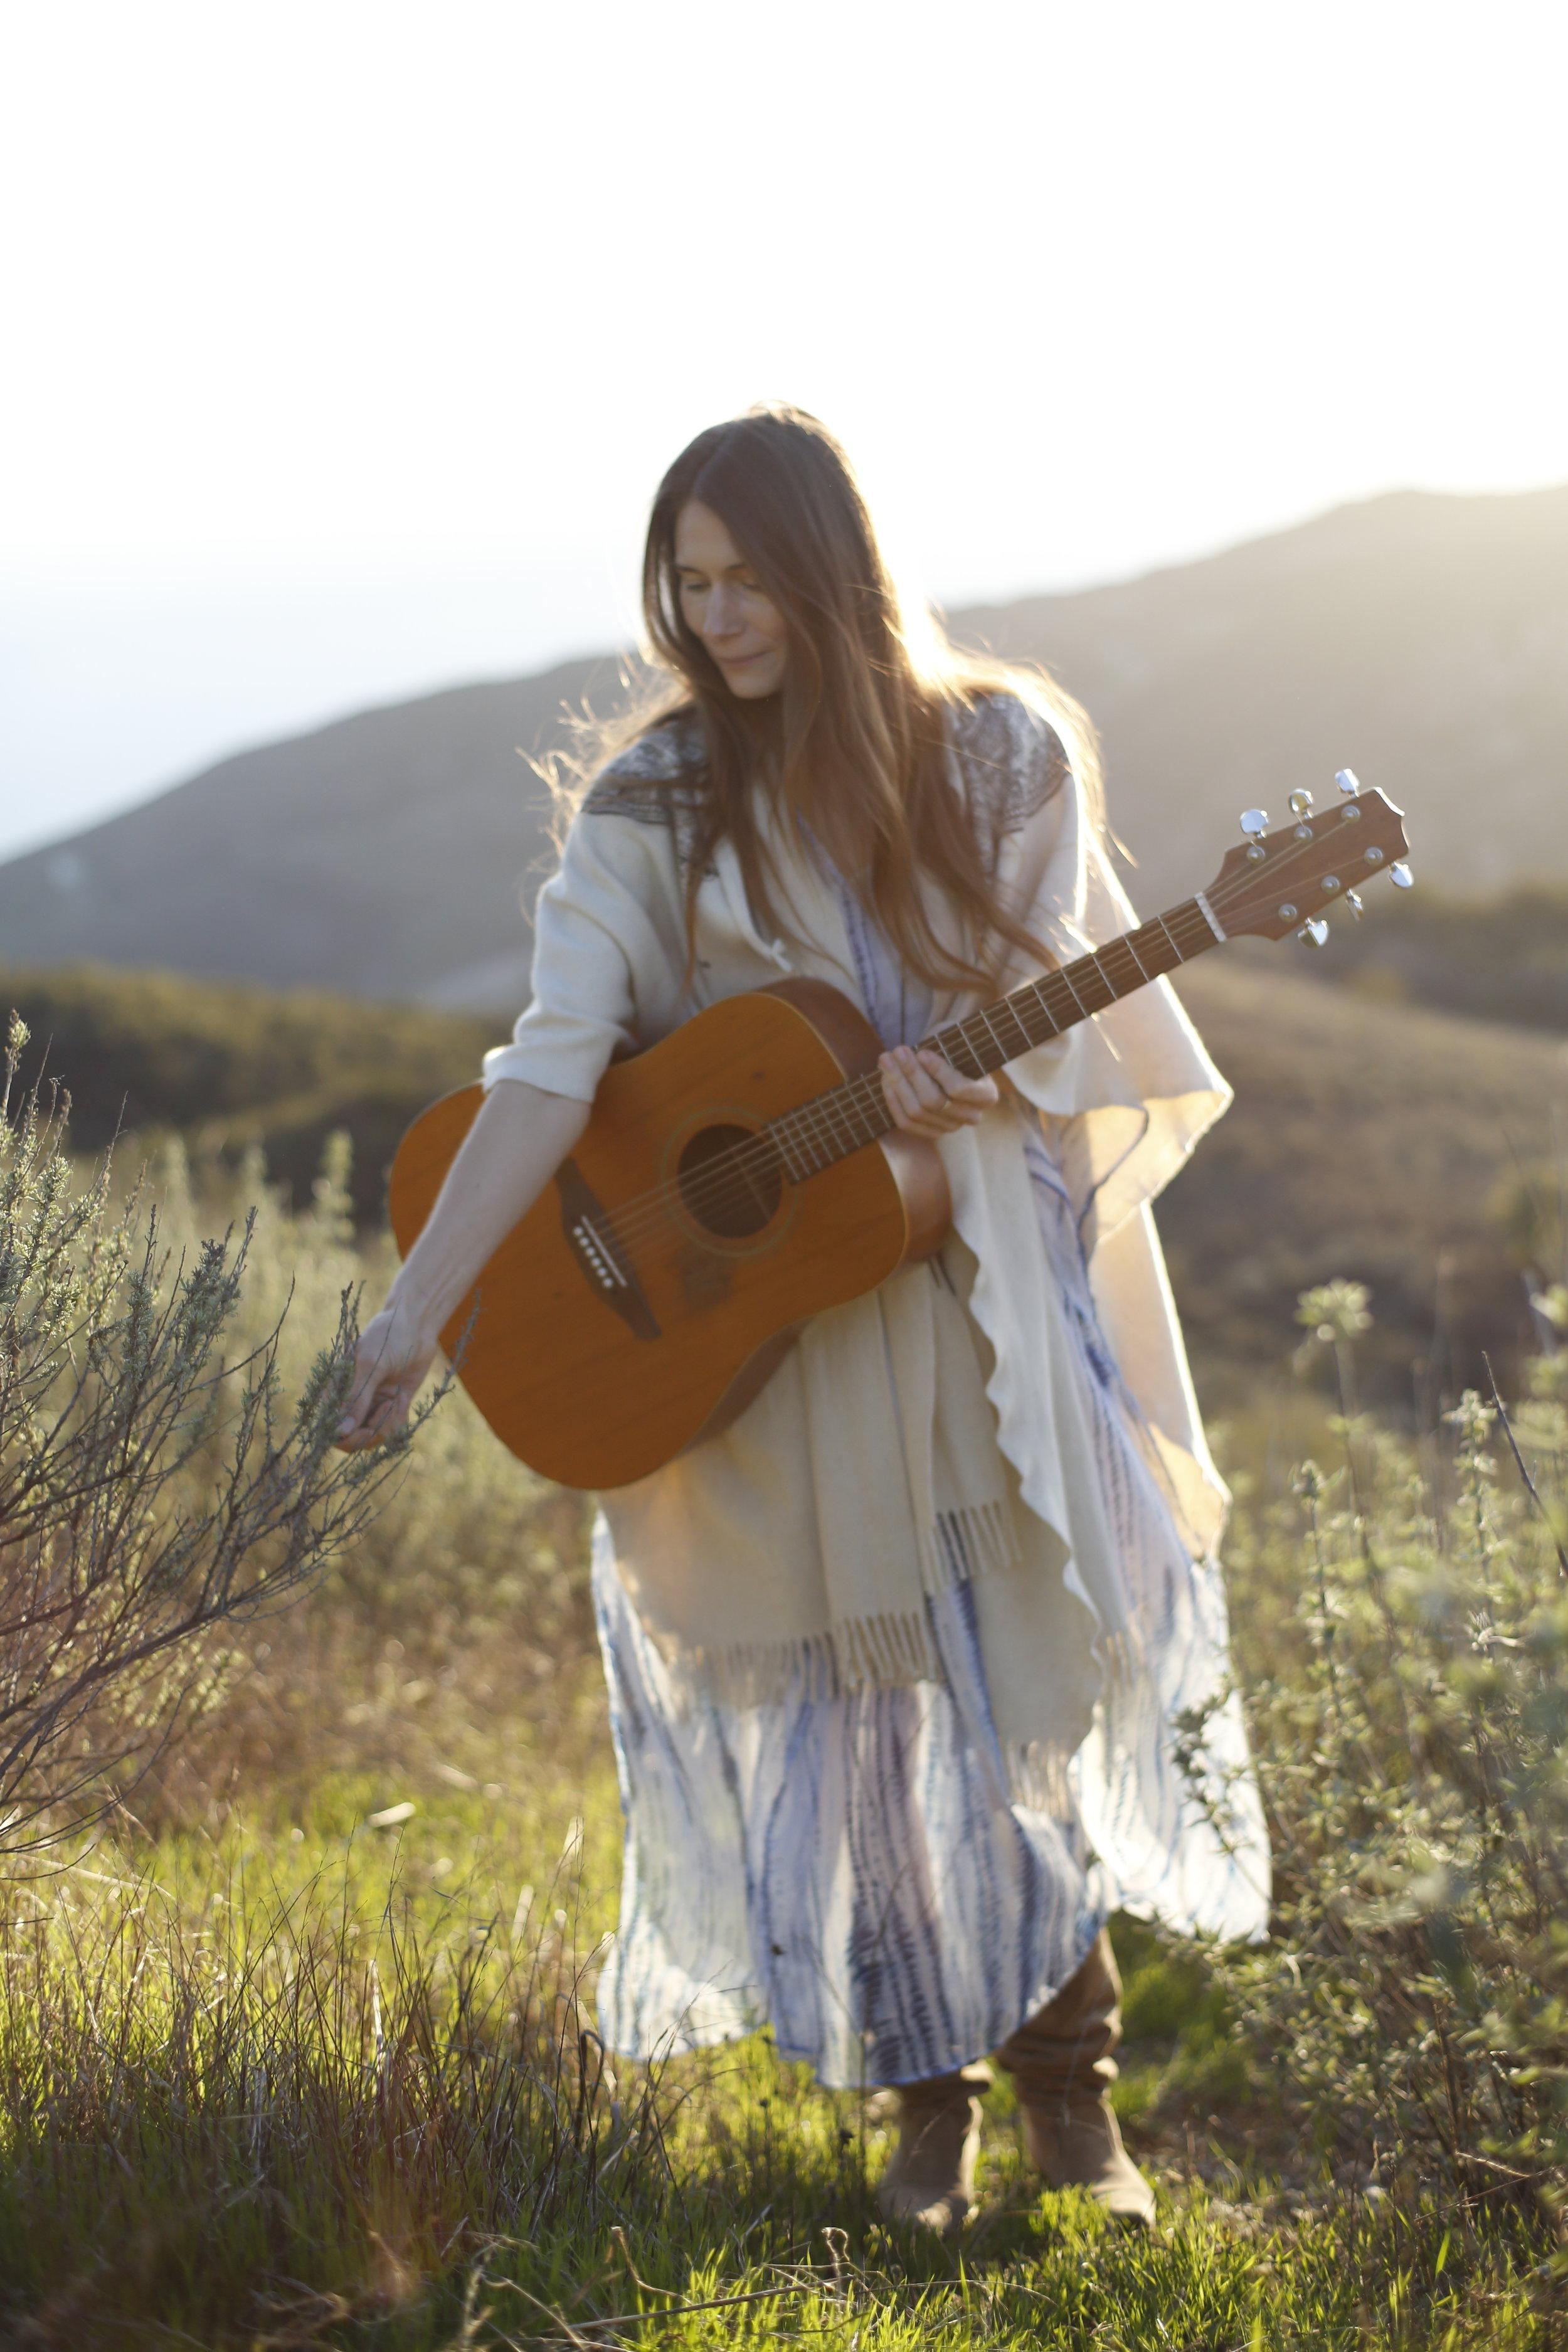 Paula Ferraro Songstar Scents Of Awe